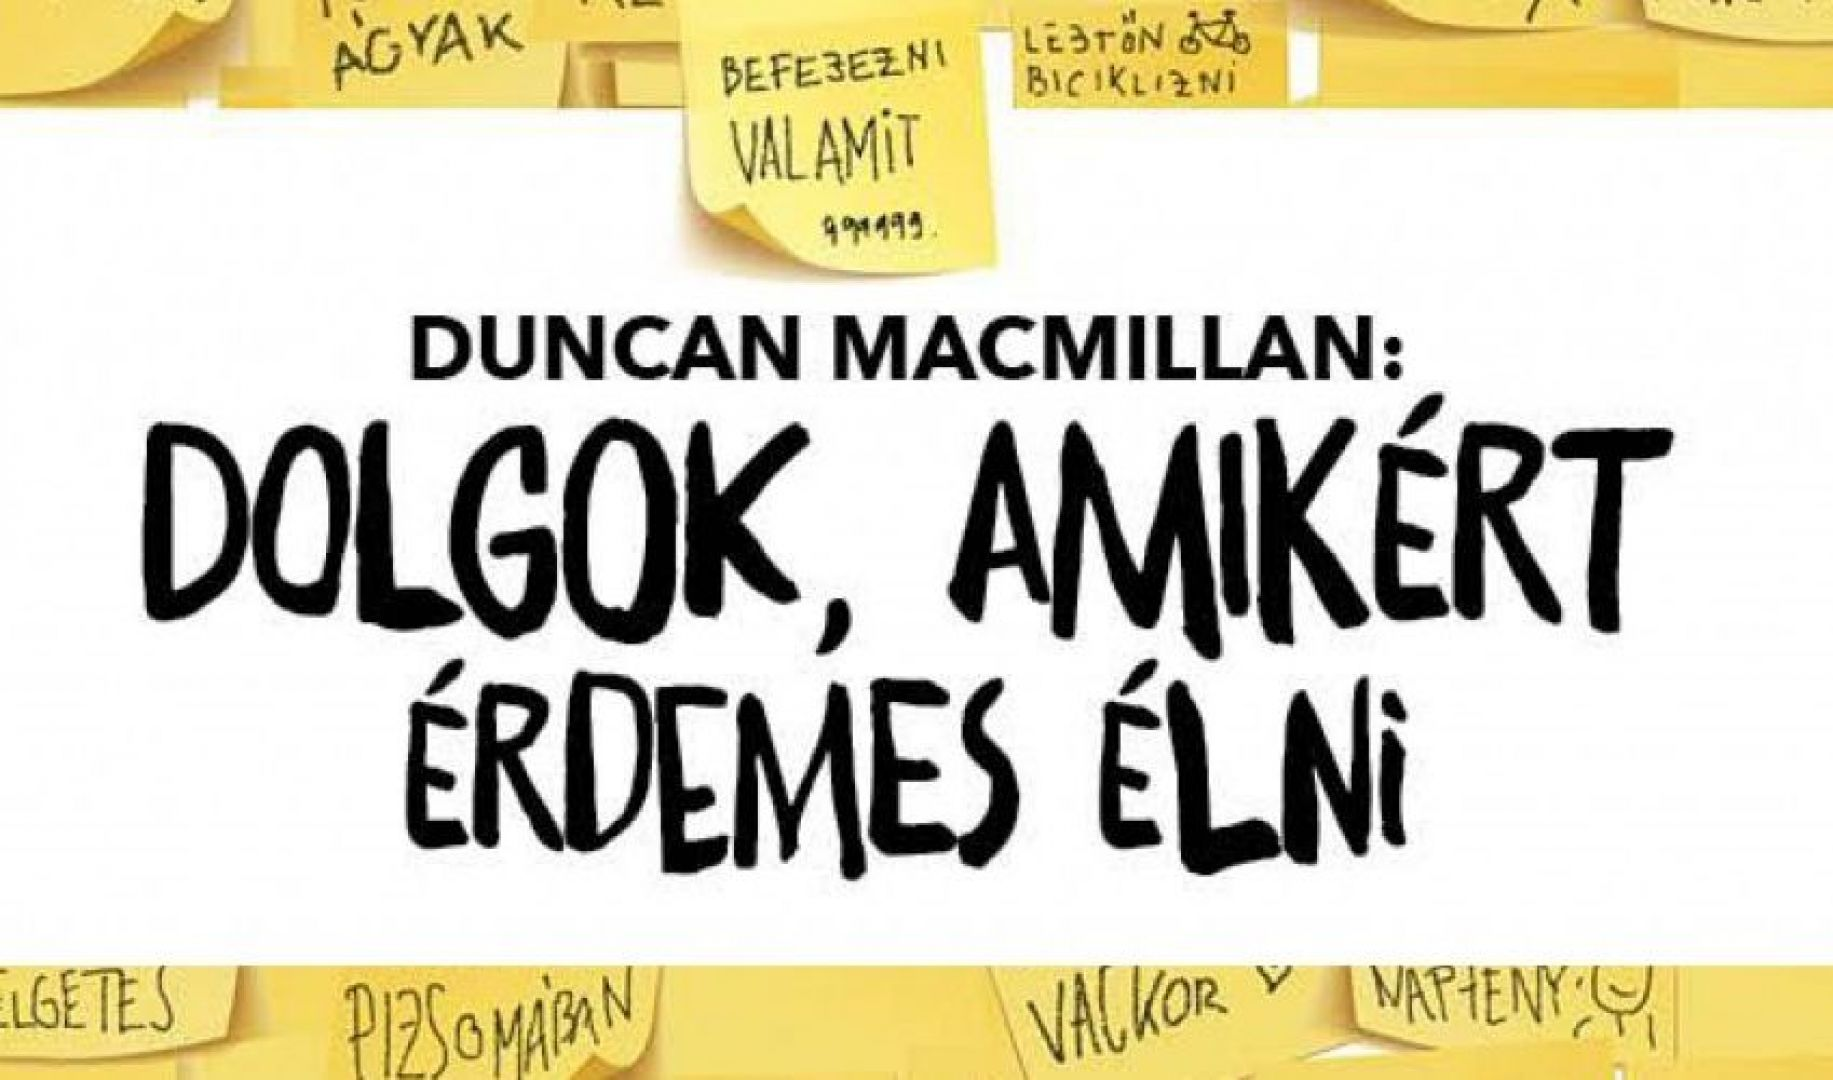 macmillan_dolgok_amikert_erdemes_elni_plakat.jpg